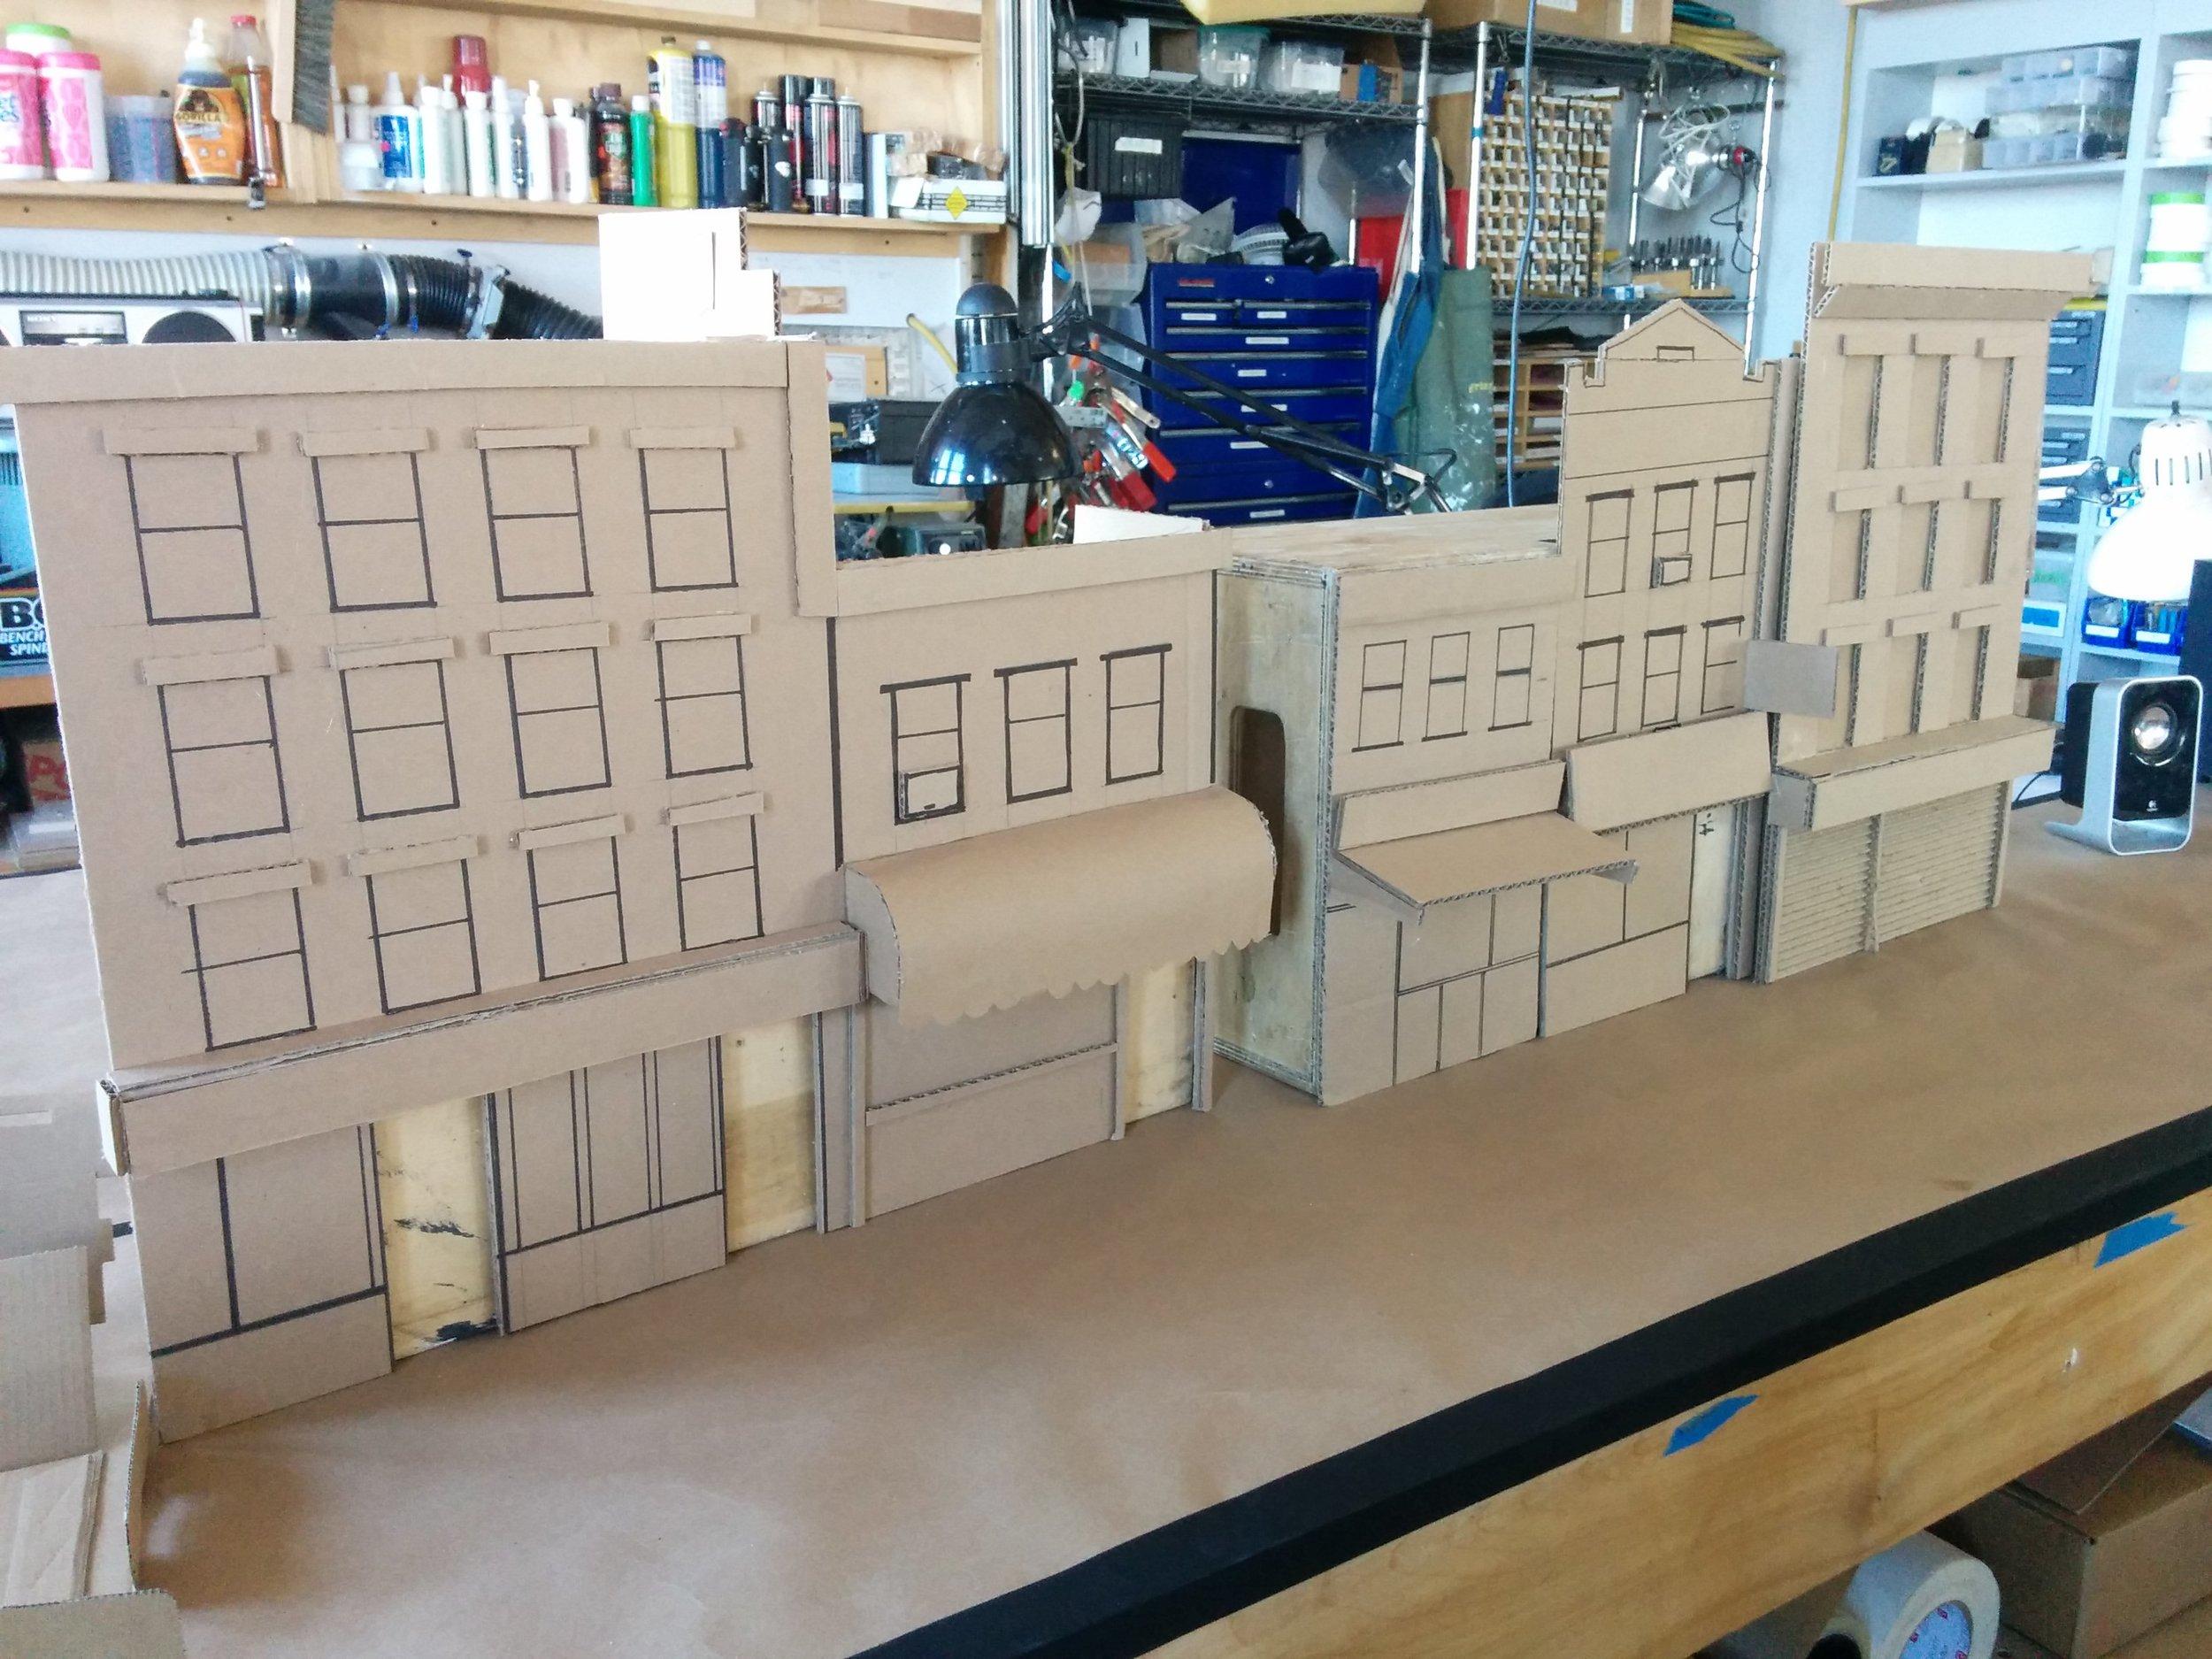 Mock set created for the Brooklyn street scene for Hardboiled.